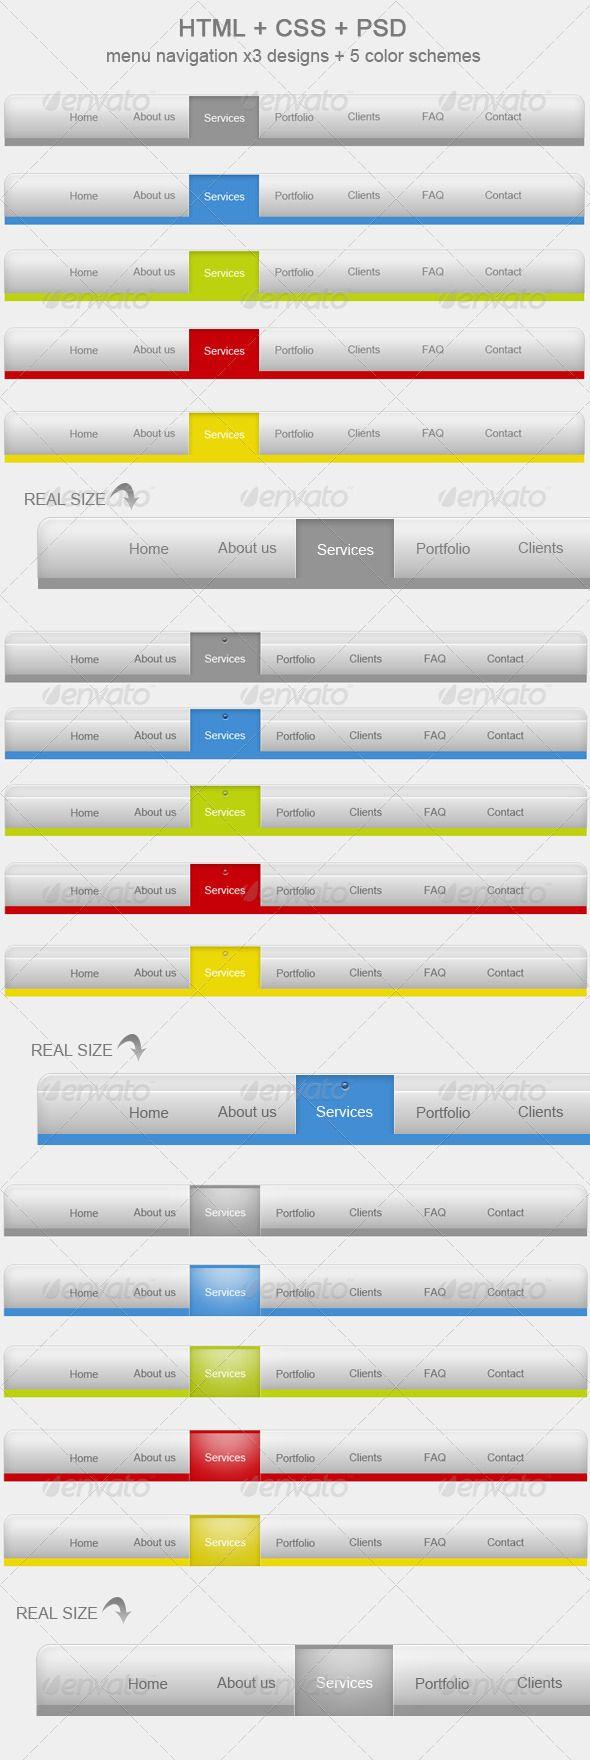 HTML + CSS + PSD menu x 15 + 5 colors! V3